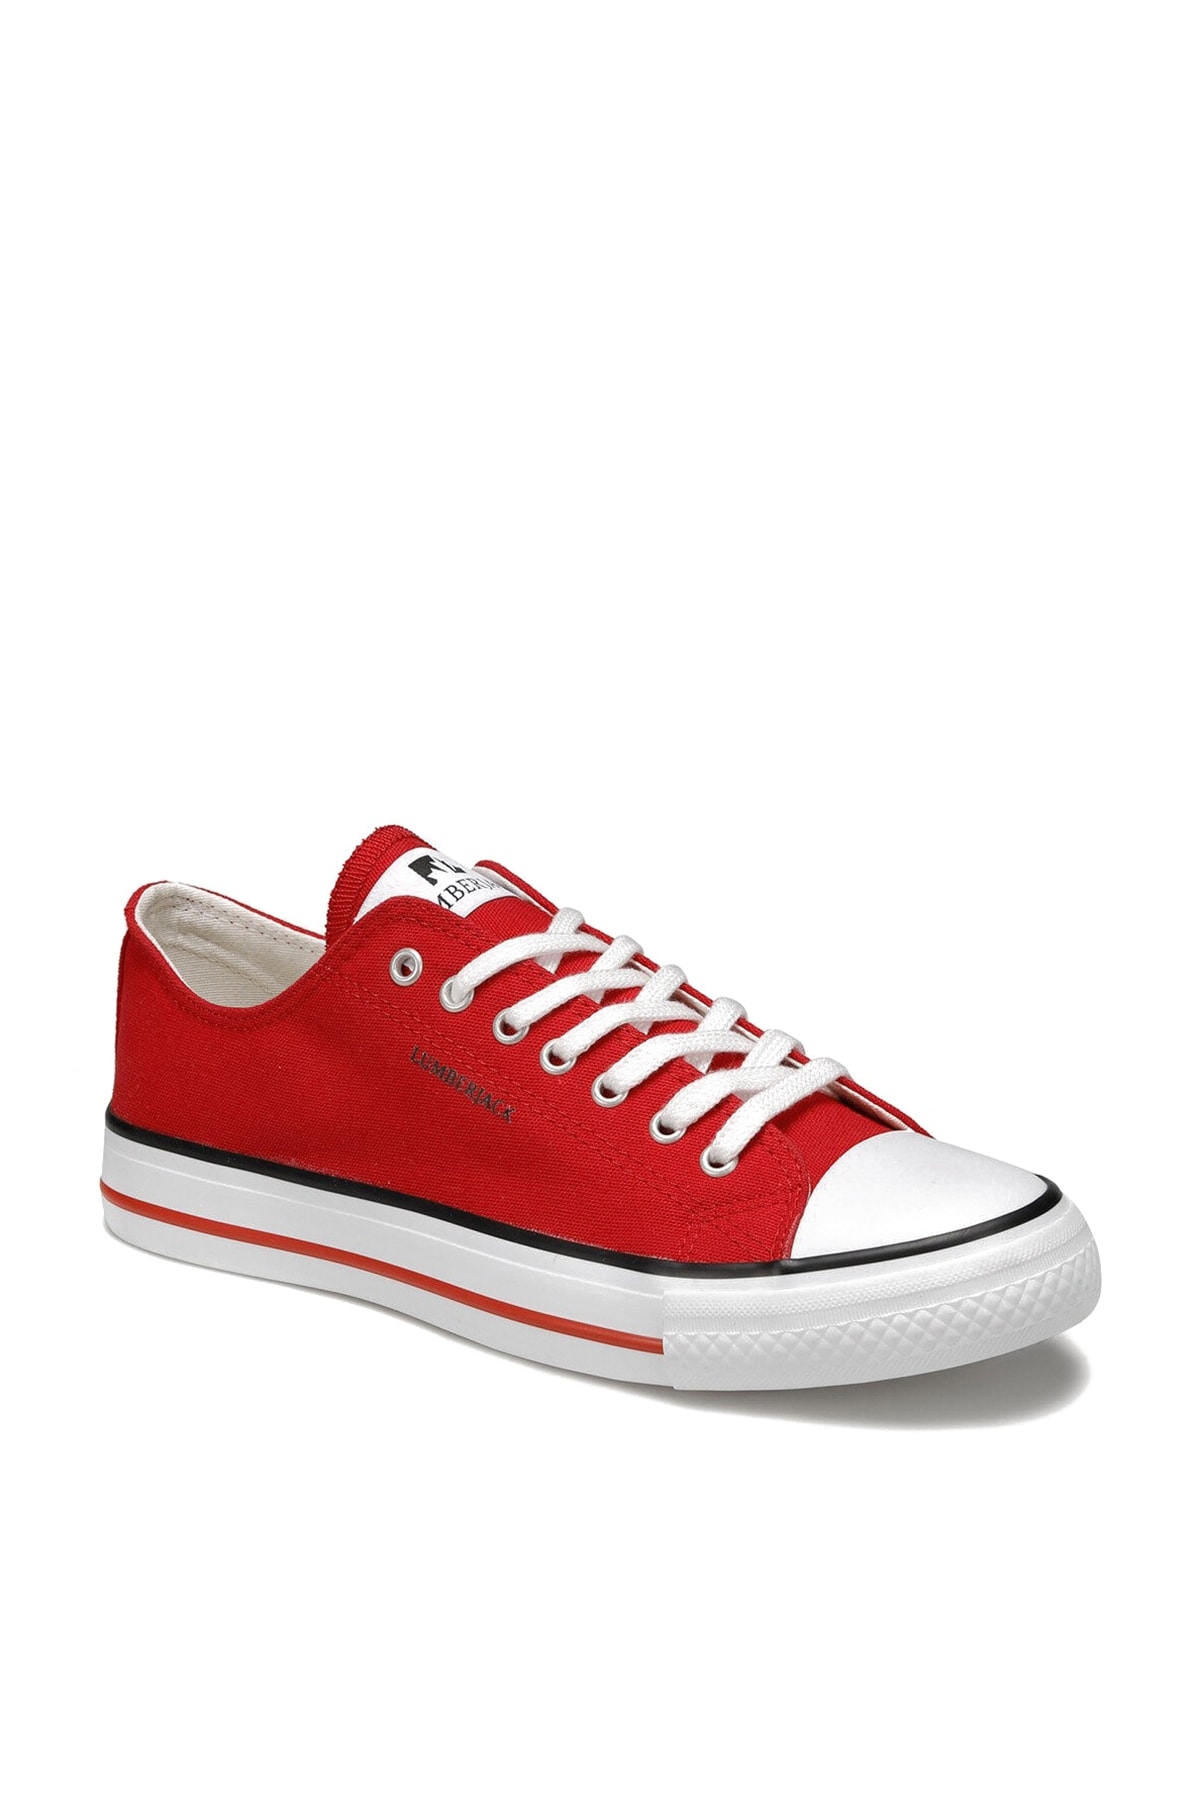 lumberjack Erkek Ayakkabı Maxwell 100506841 1